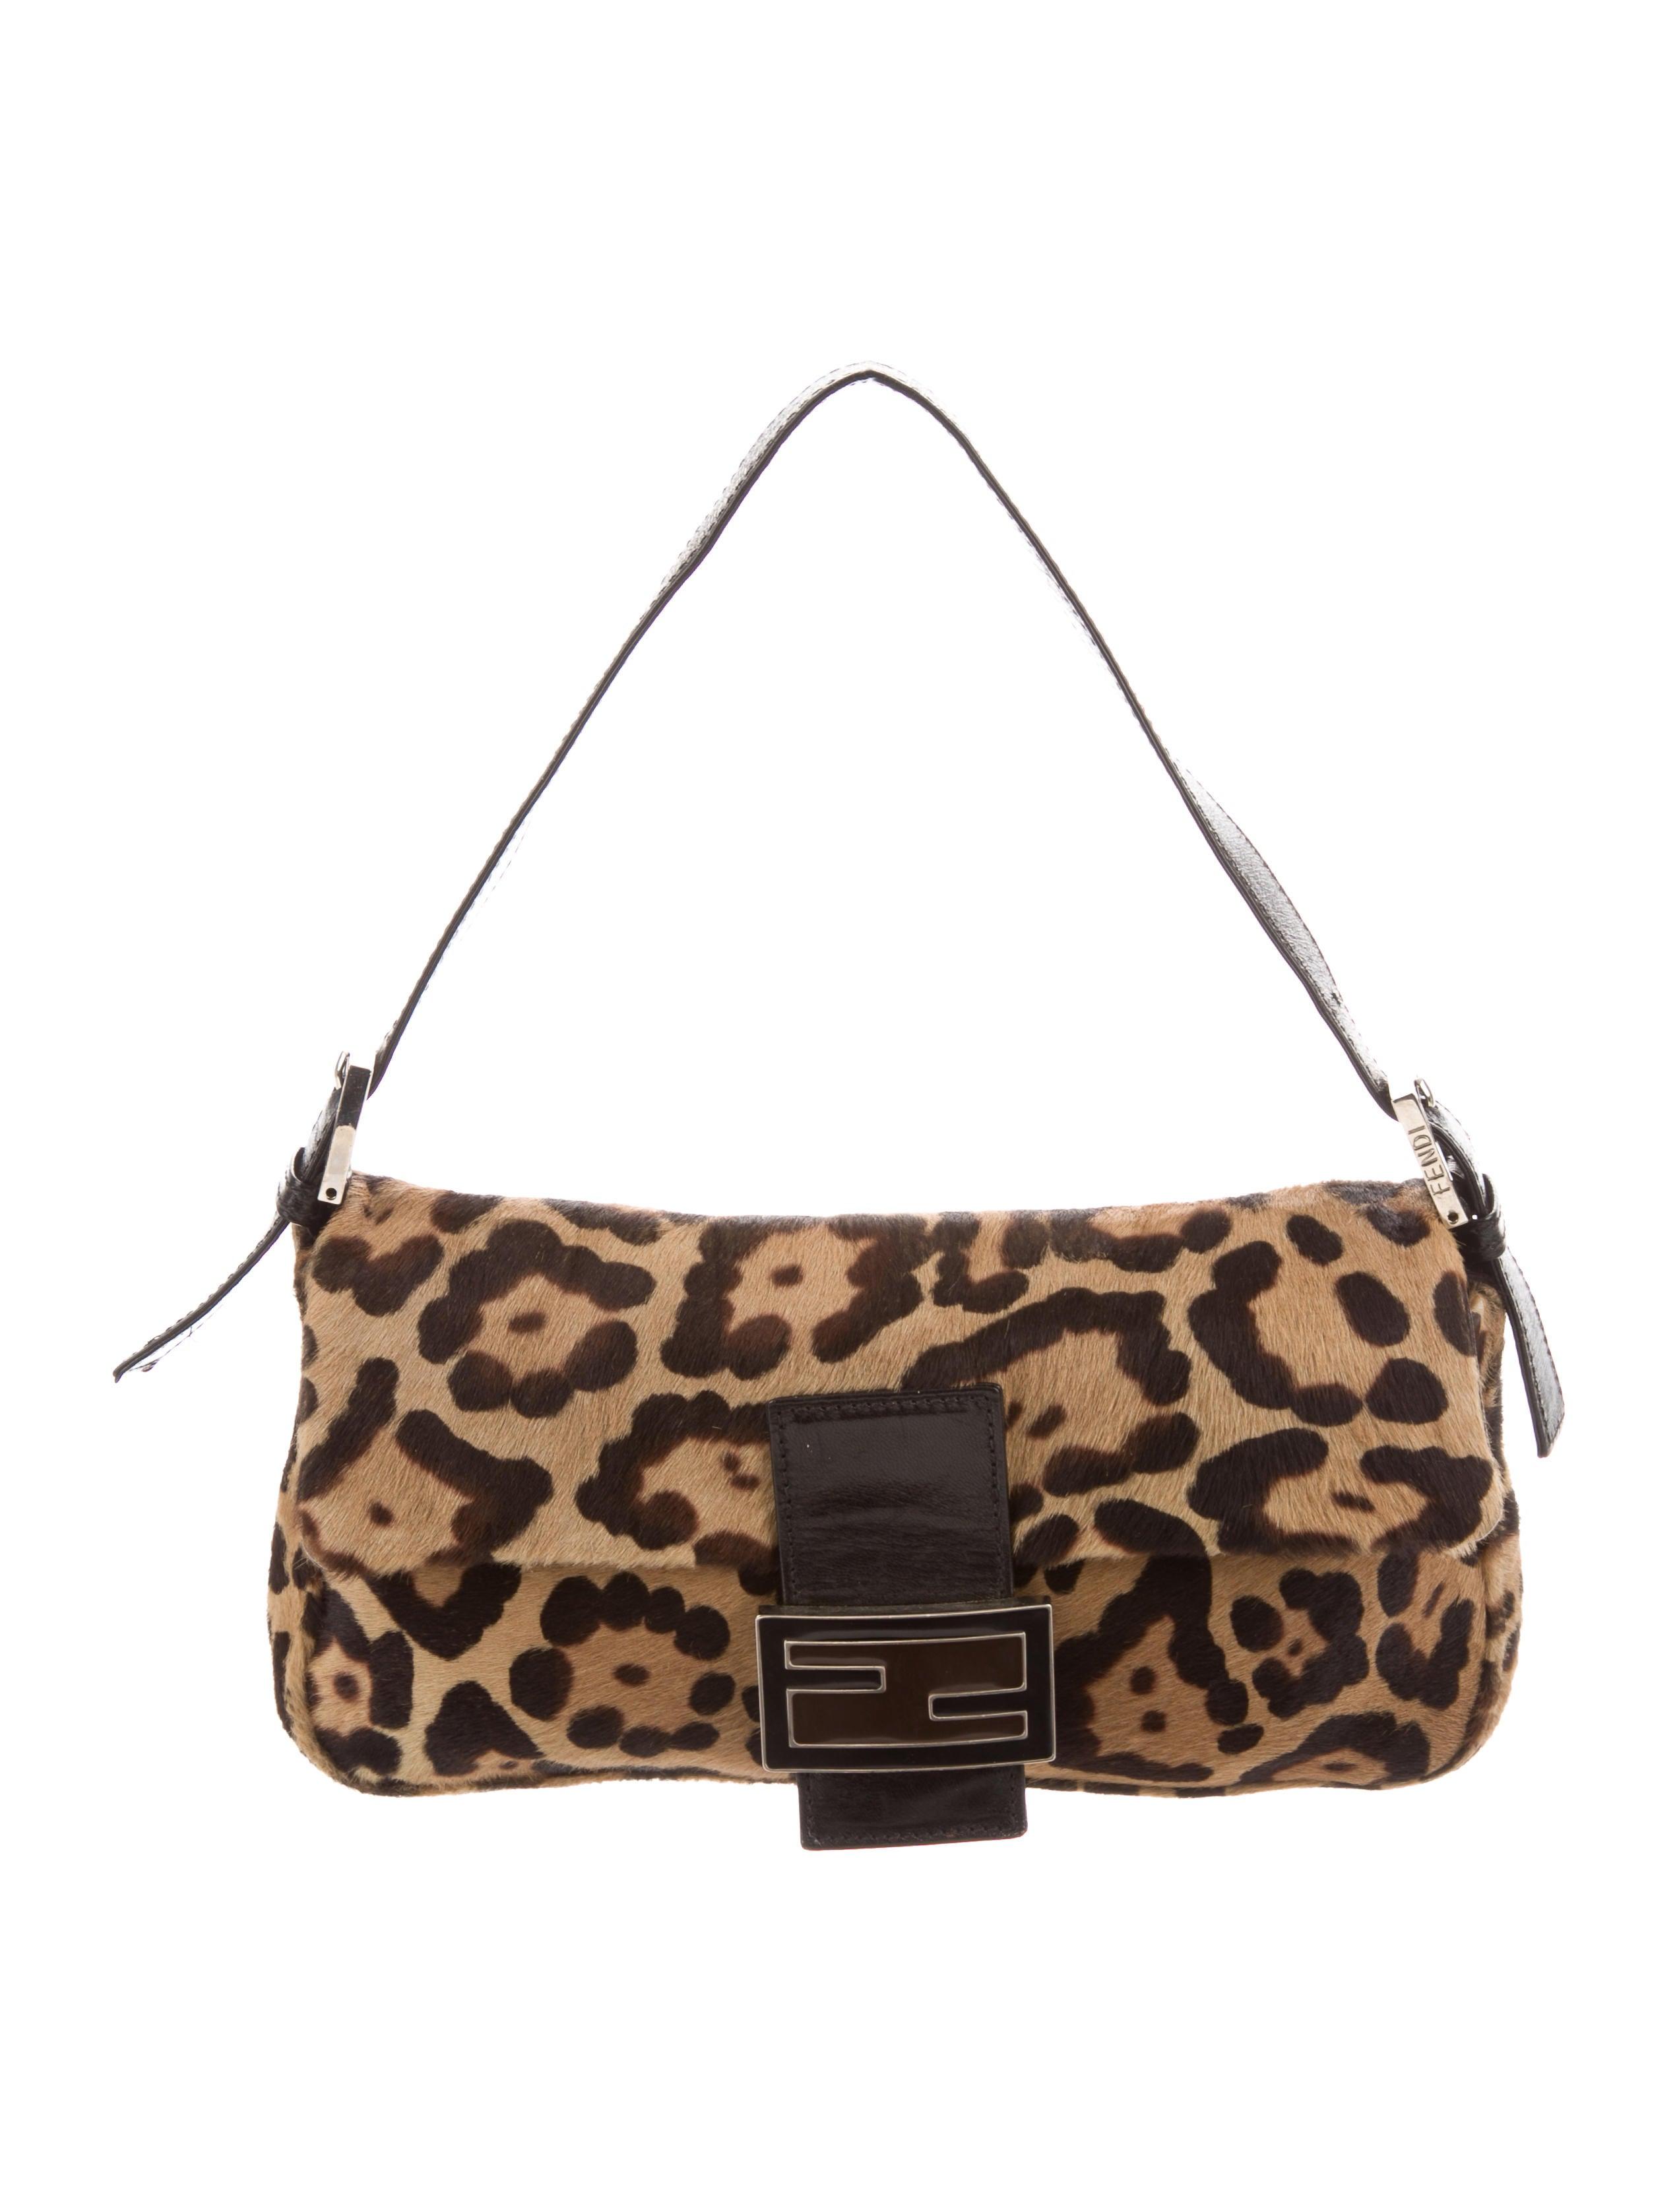 59521611d8 Fendi Animal Print Ponyhair Baguette - Handbags - FEN74109